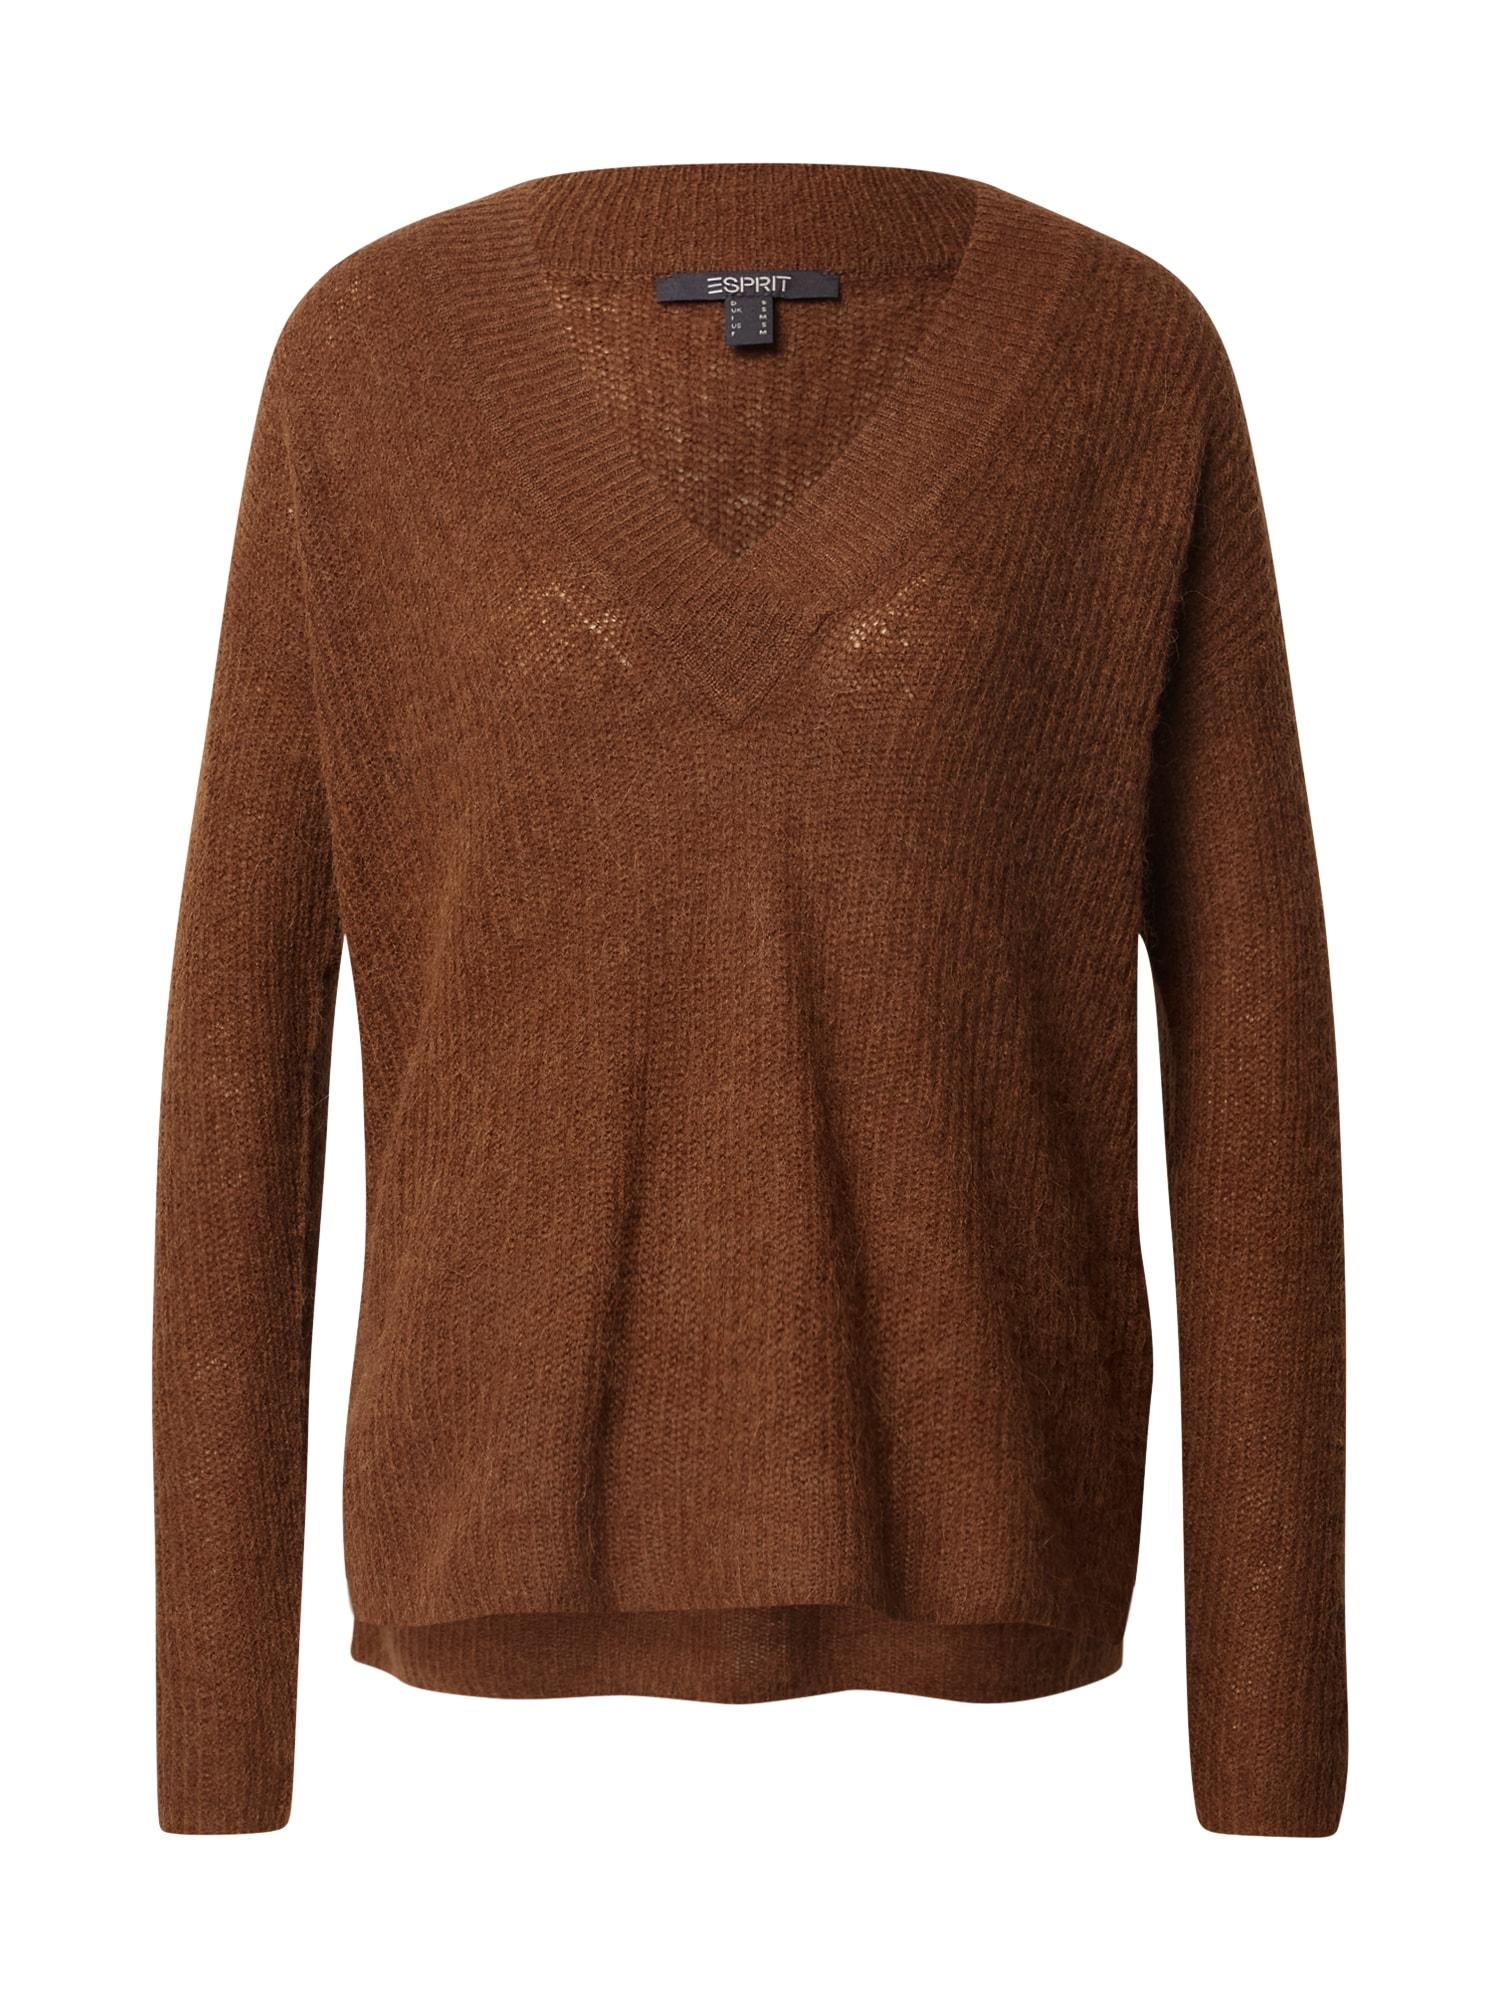 Esprit Collection Megztinis karamelės